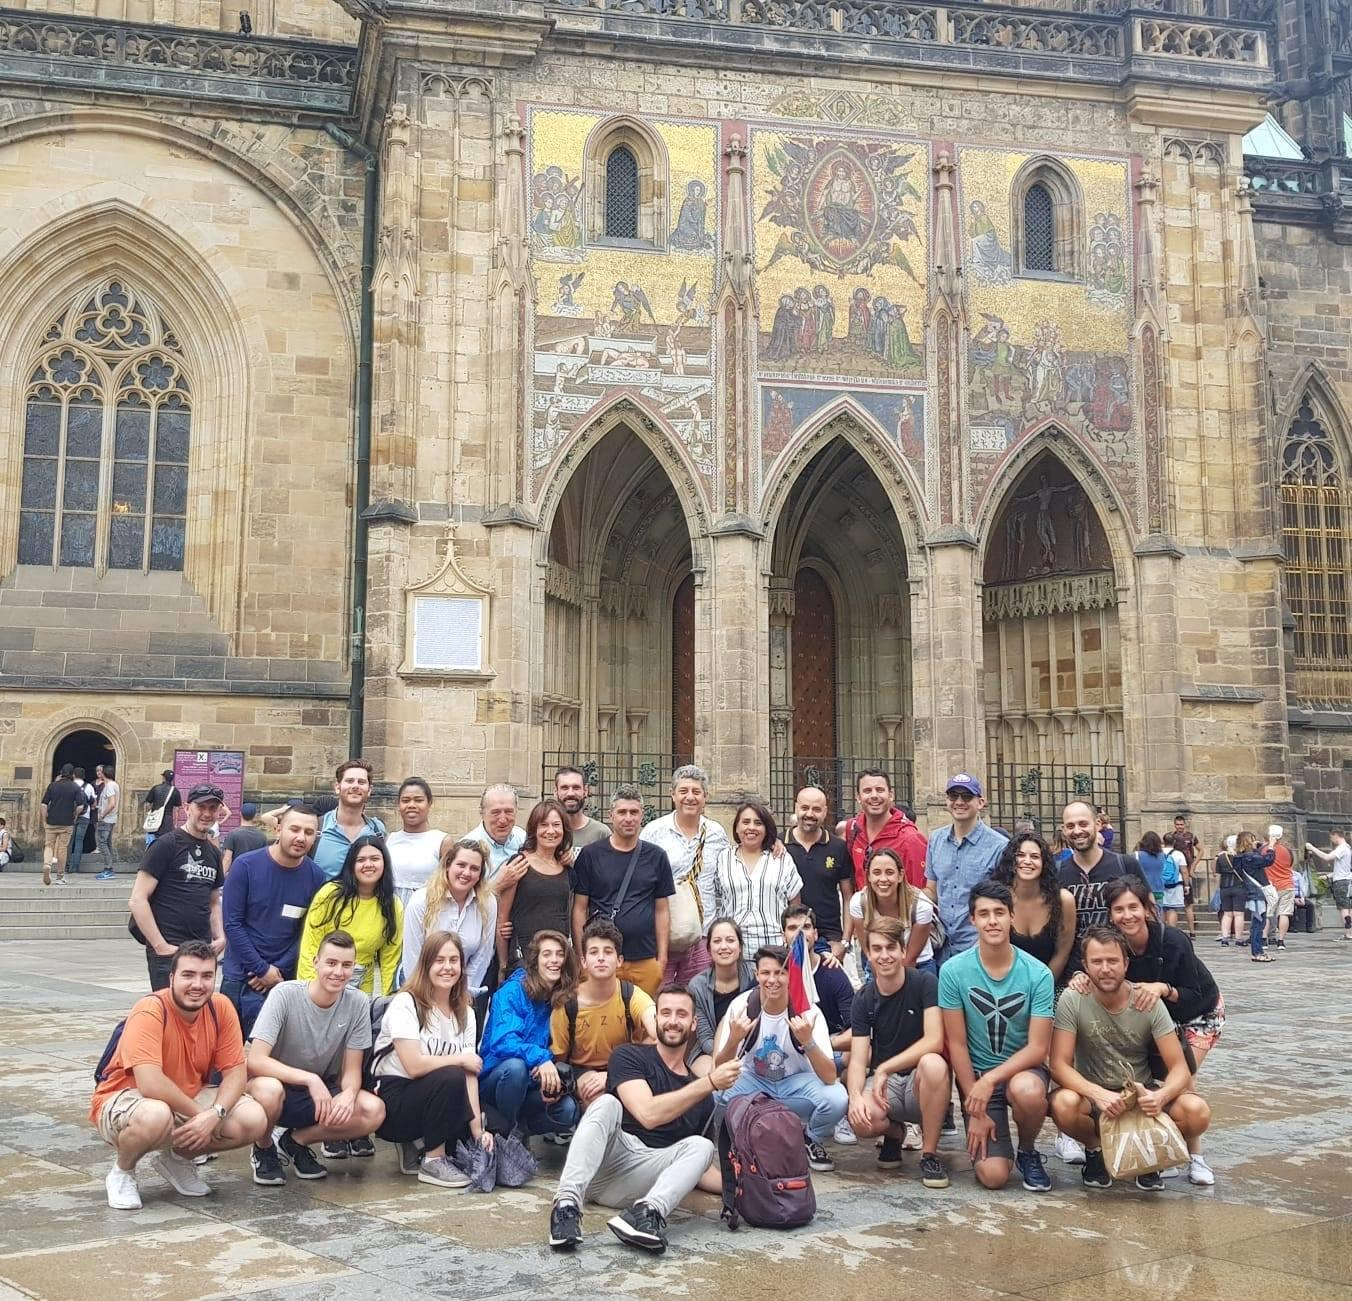 prague-castle-and-mala-strana-district-tour-12